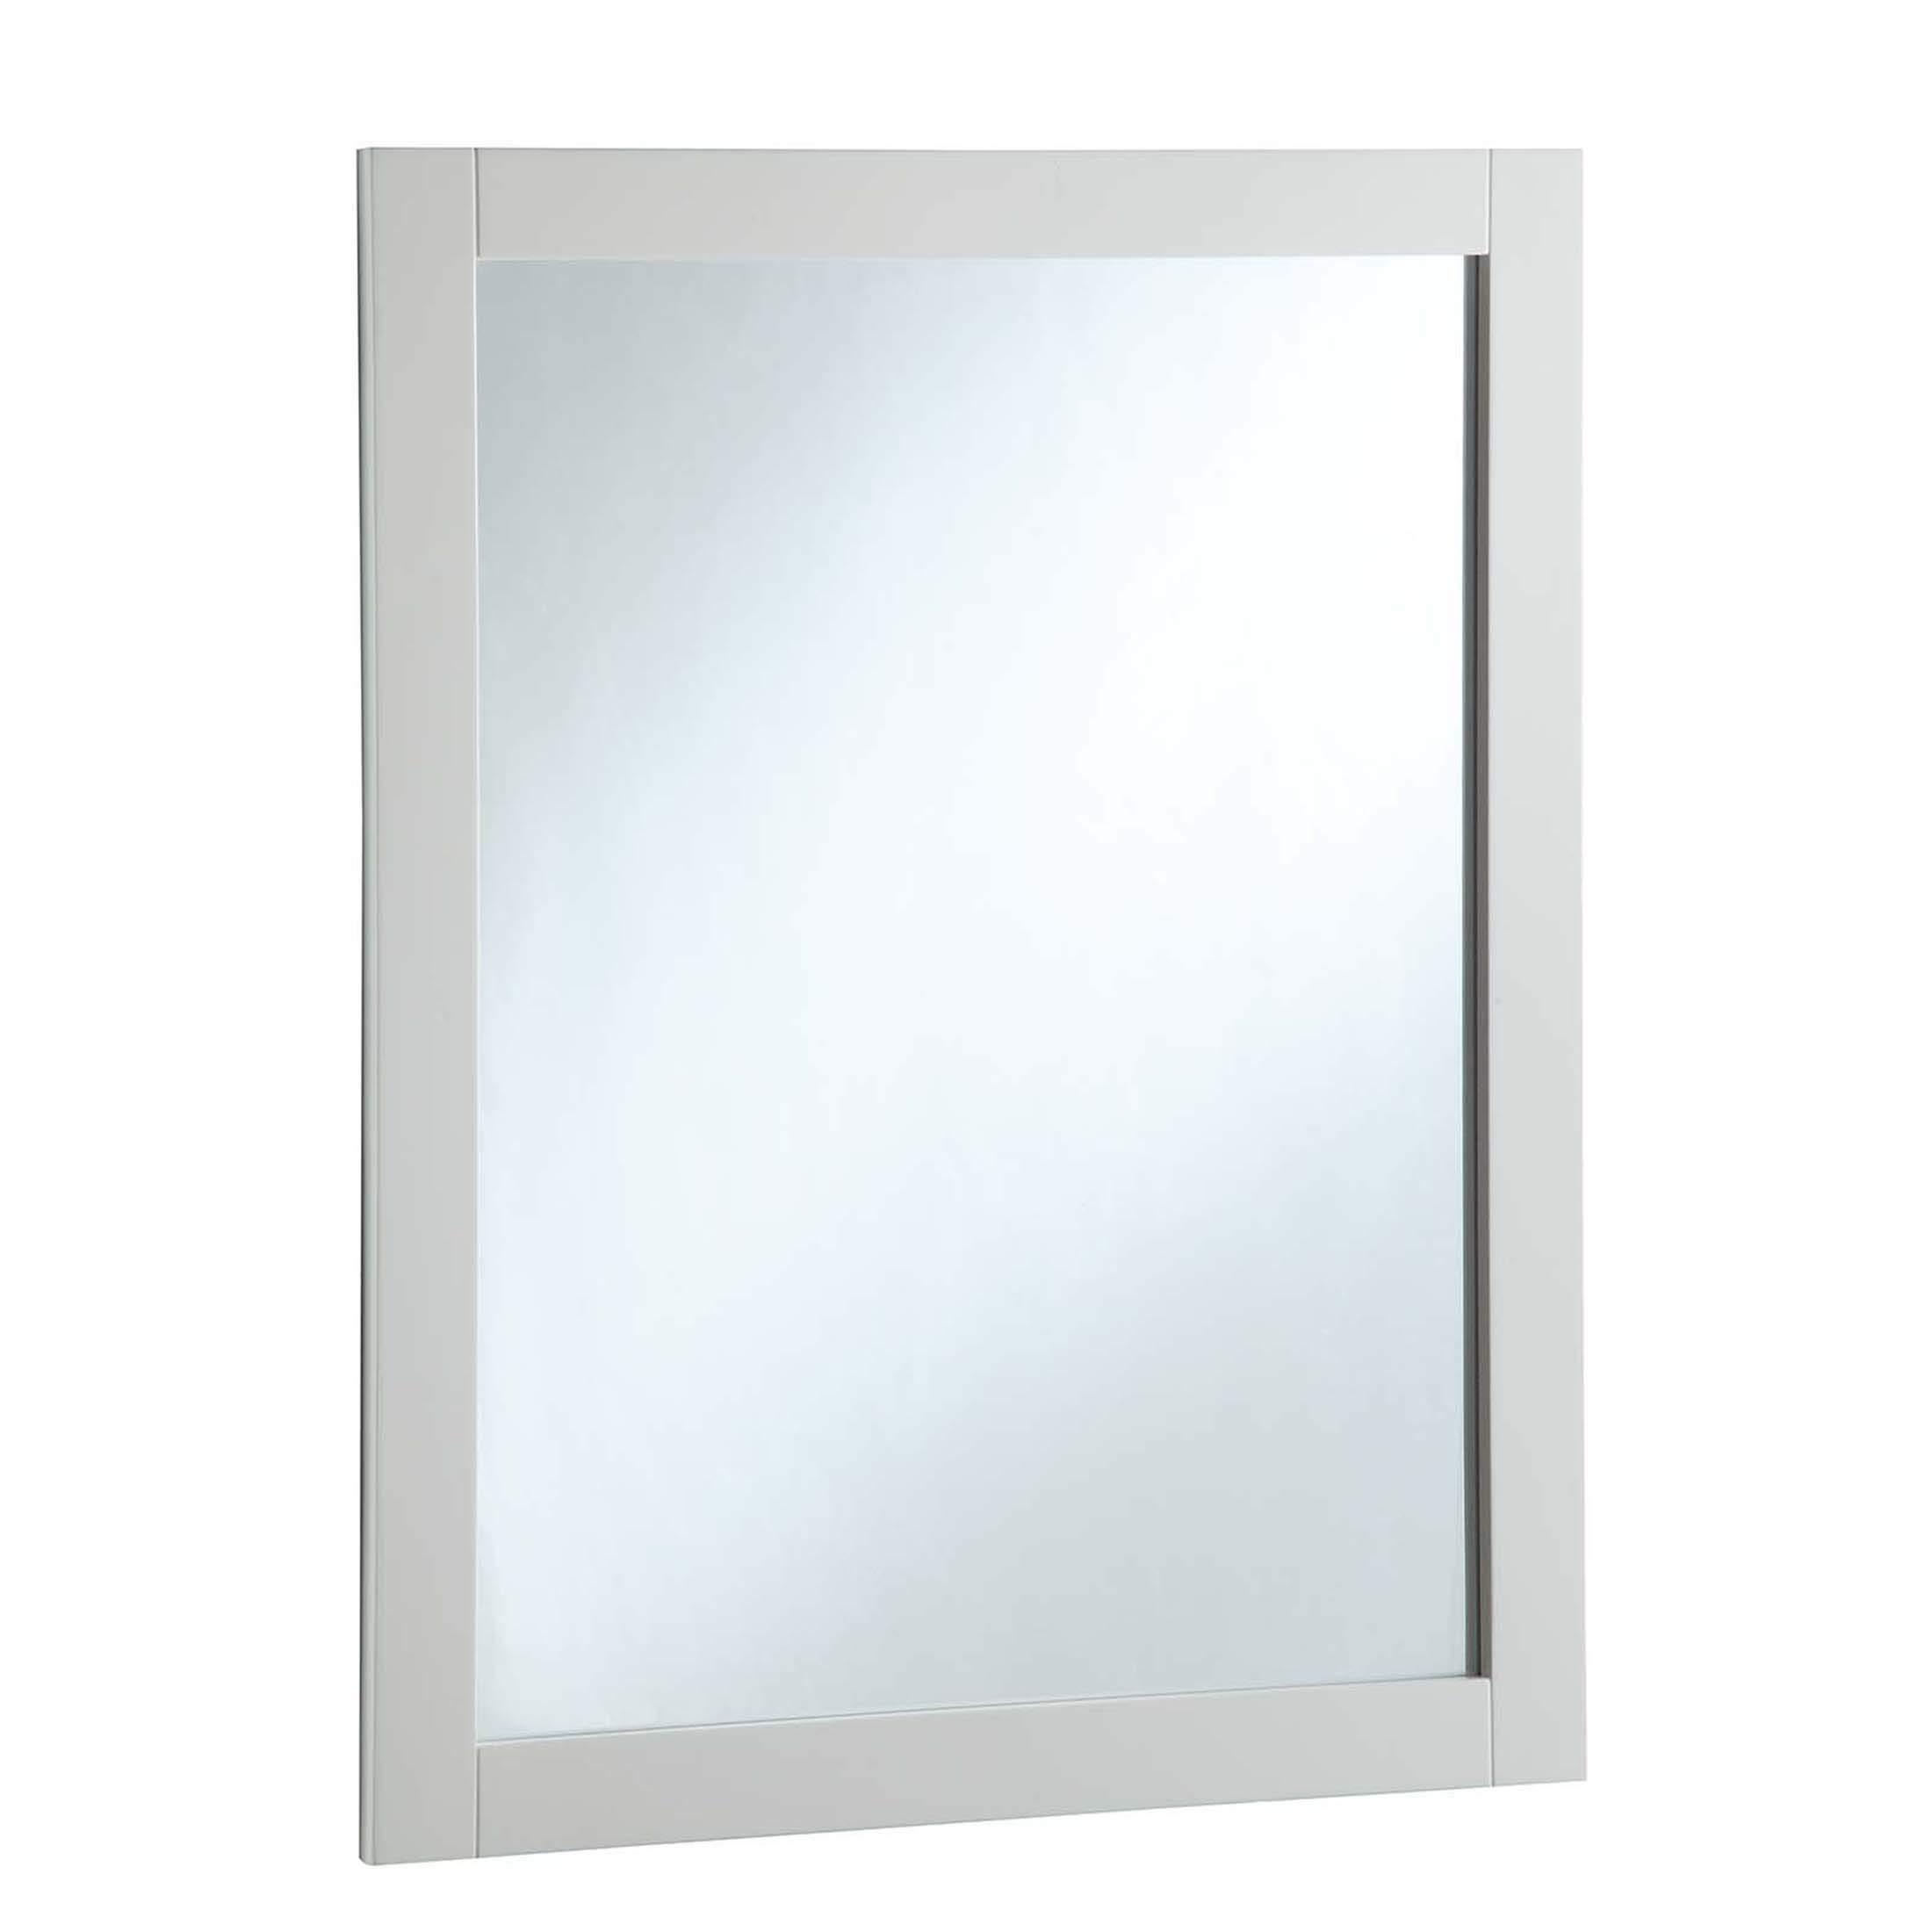 Design House 547216 24-Inch By 30-Inch Vanity Mirror, Semi-Gloss White,